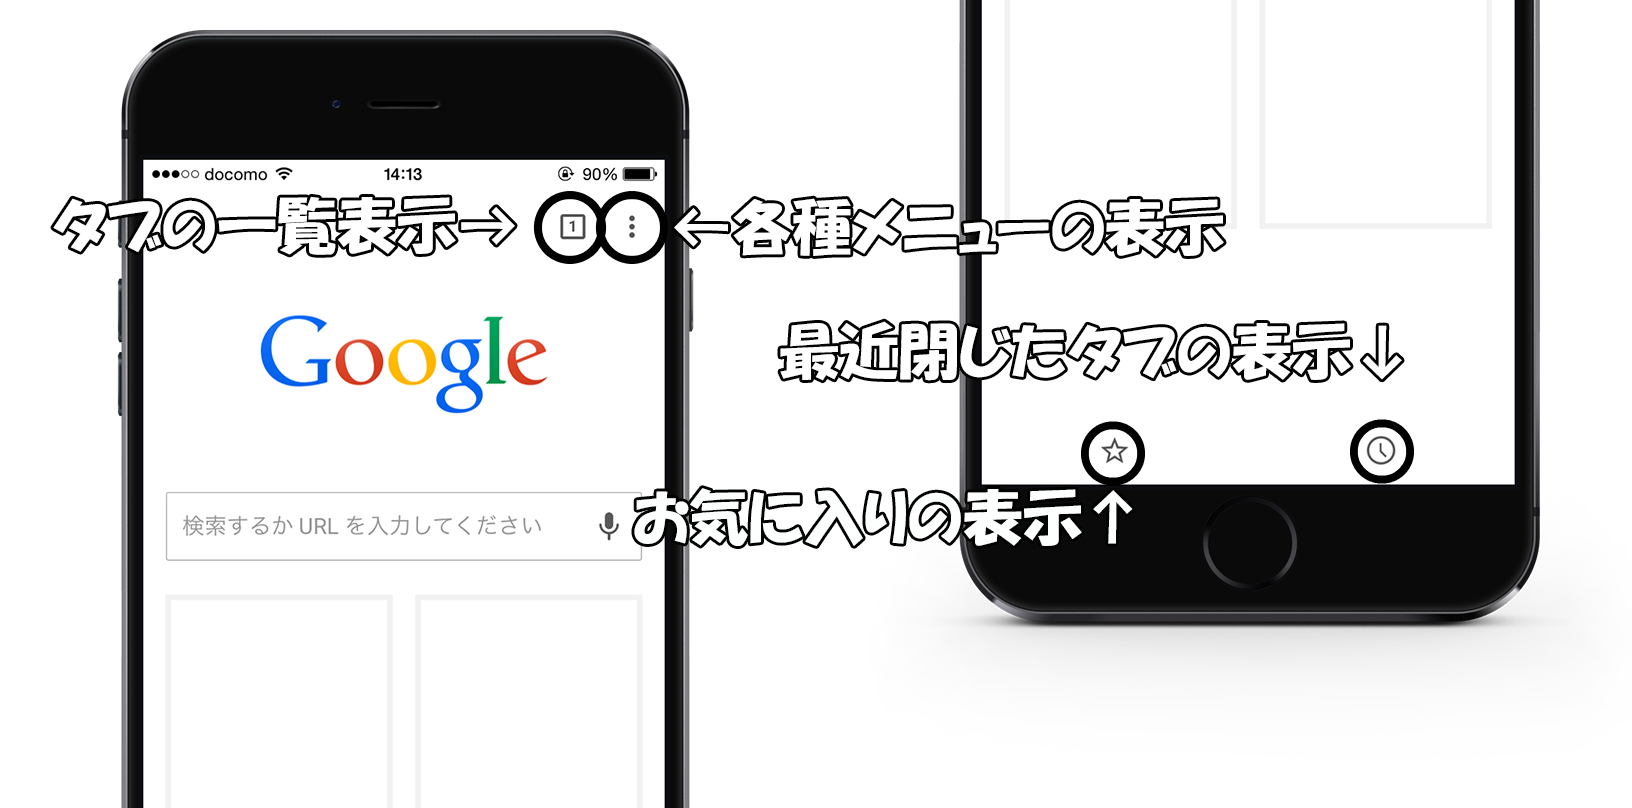 mobile_chrome_interface